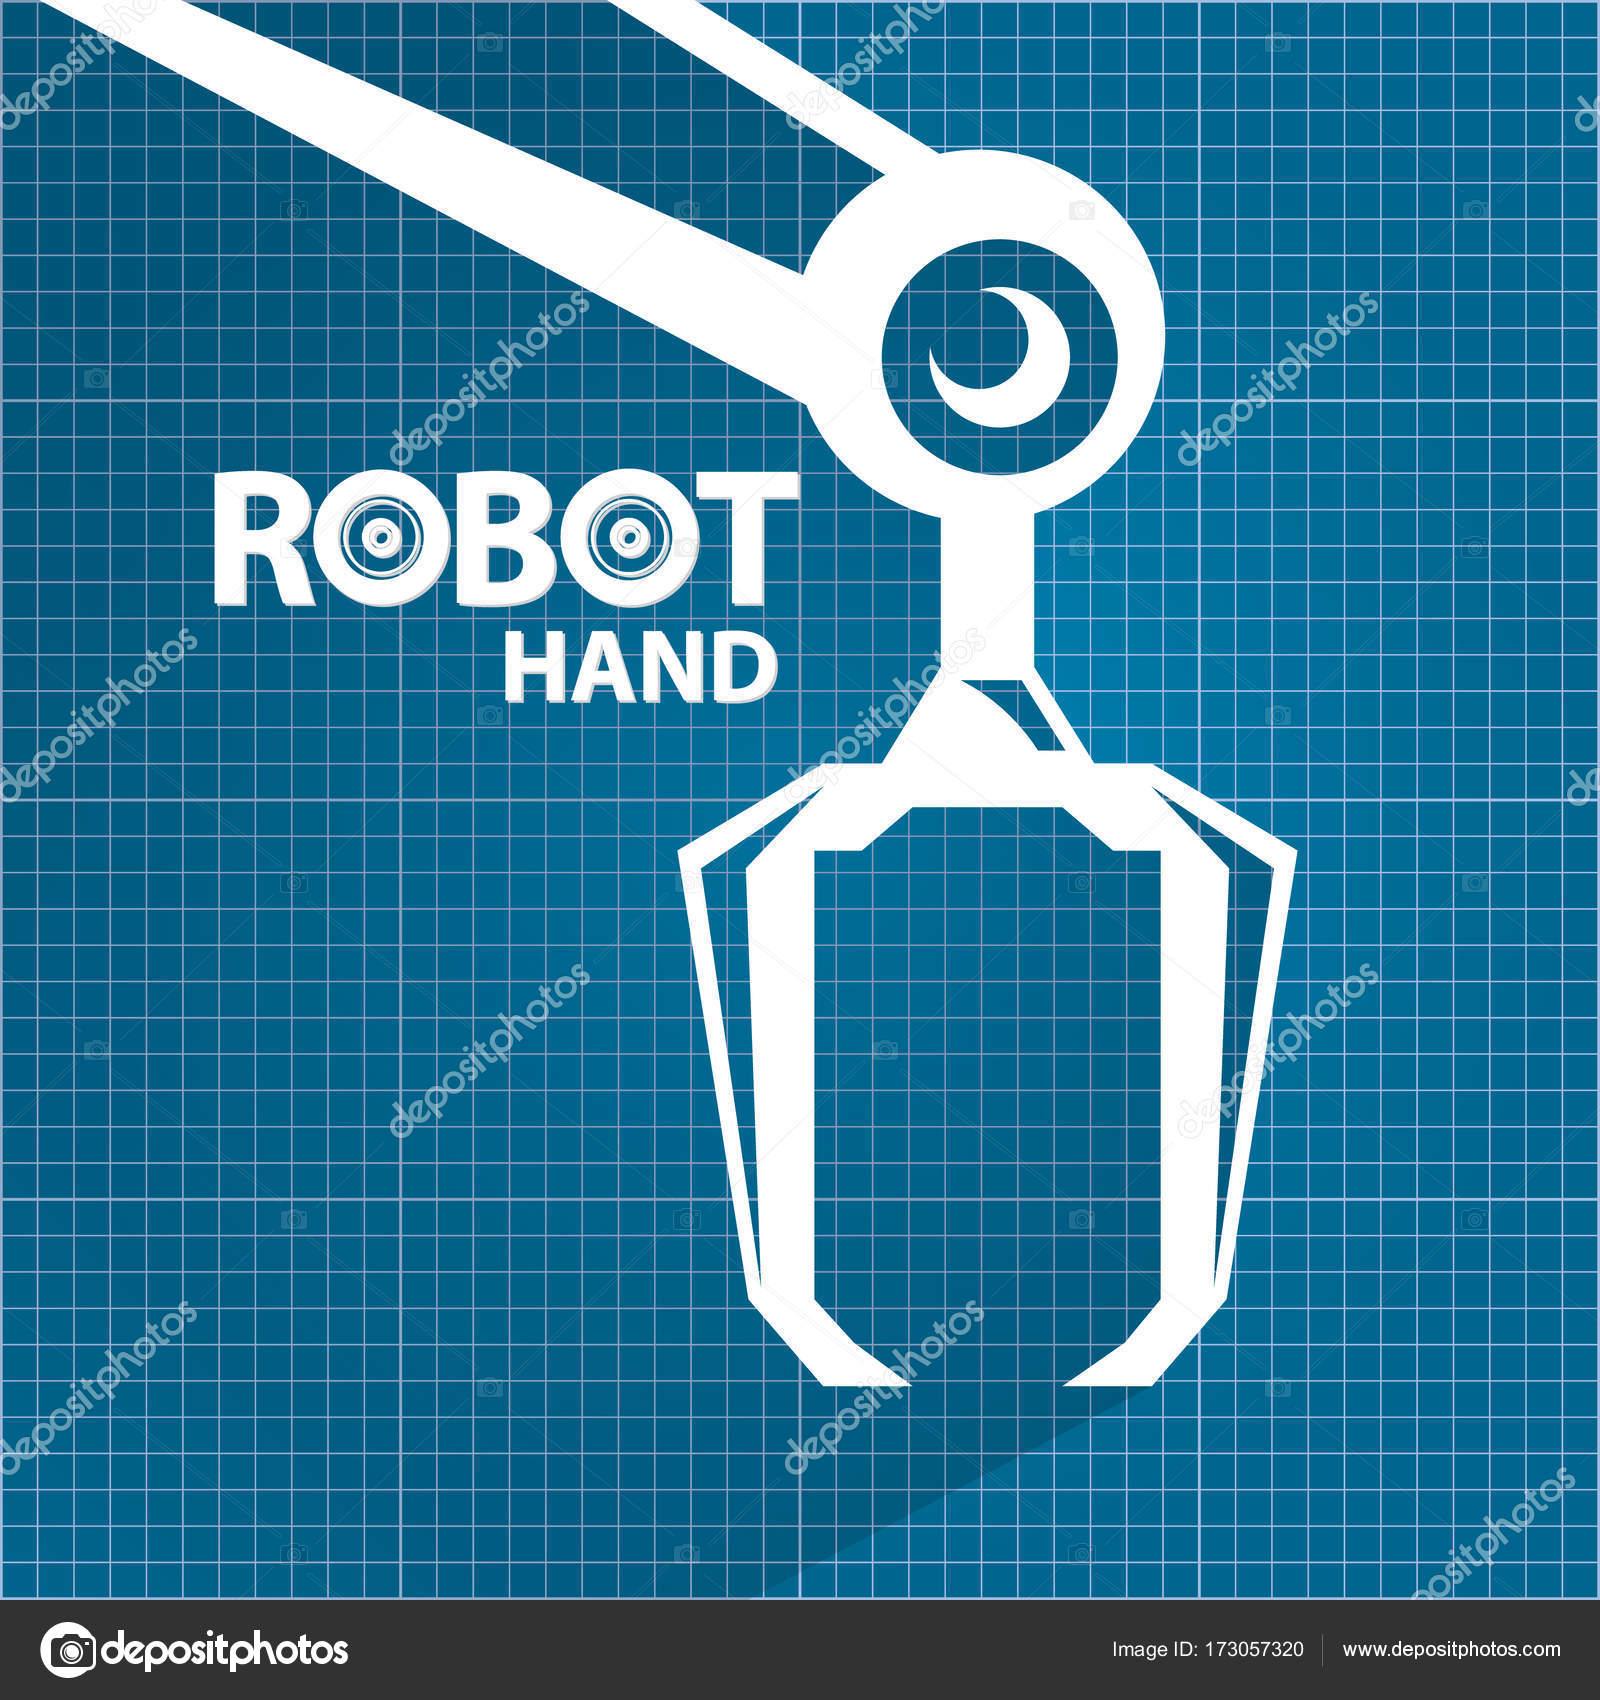 Vector robotic arm symbol on blueprint paper background robot hand vector robotic arm symbol on blueprint paper background robot hand technology background design malvernweather Gallery